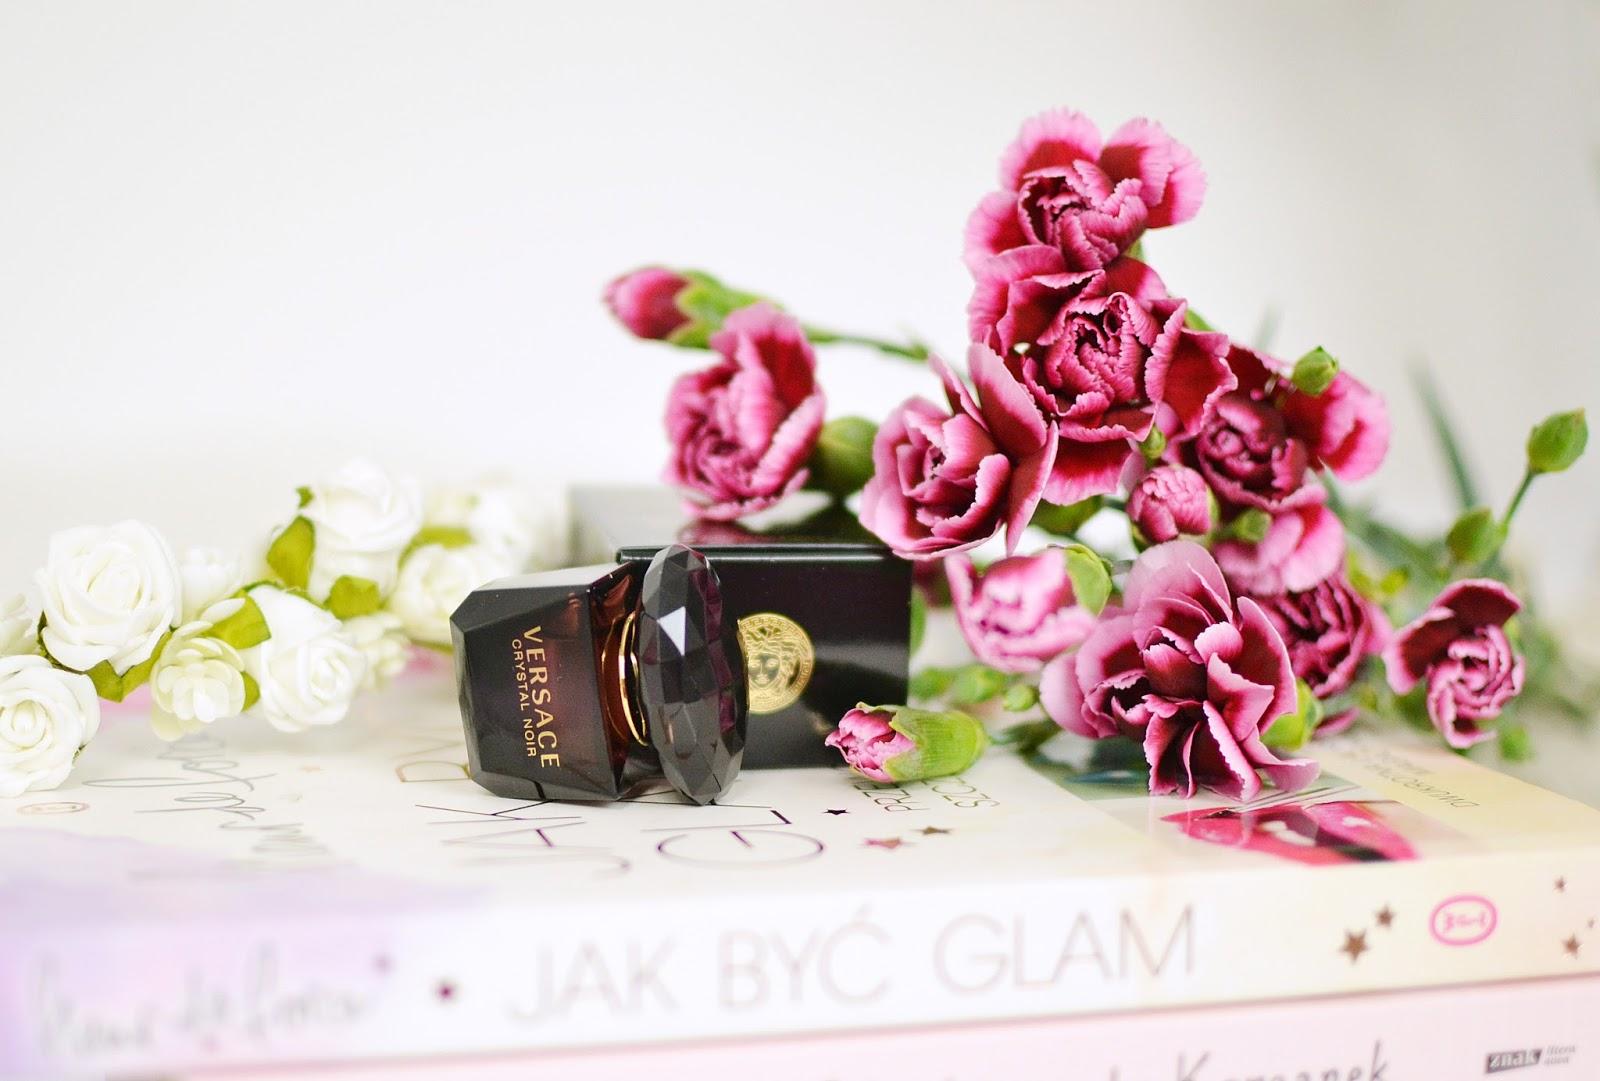 EDT Versace Crystal Noir Zapach Perfumy Woda Toaletowa